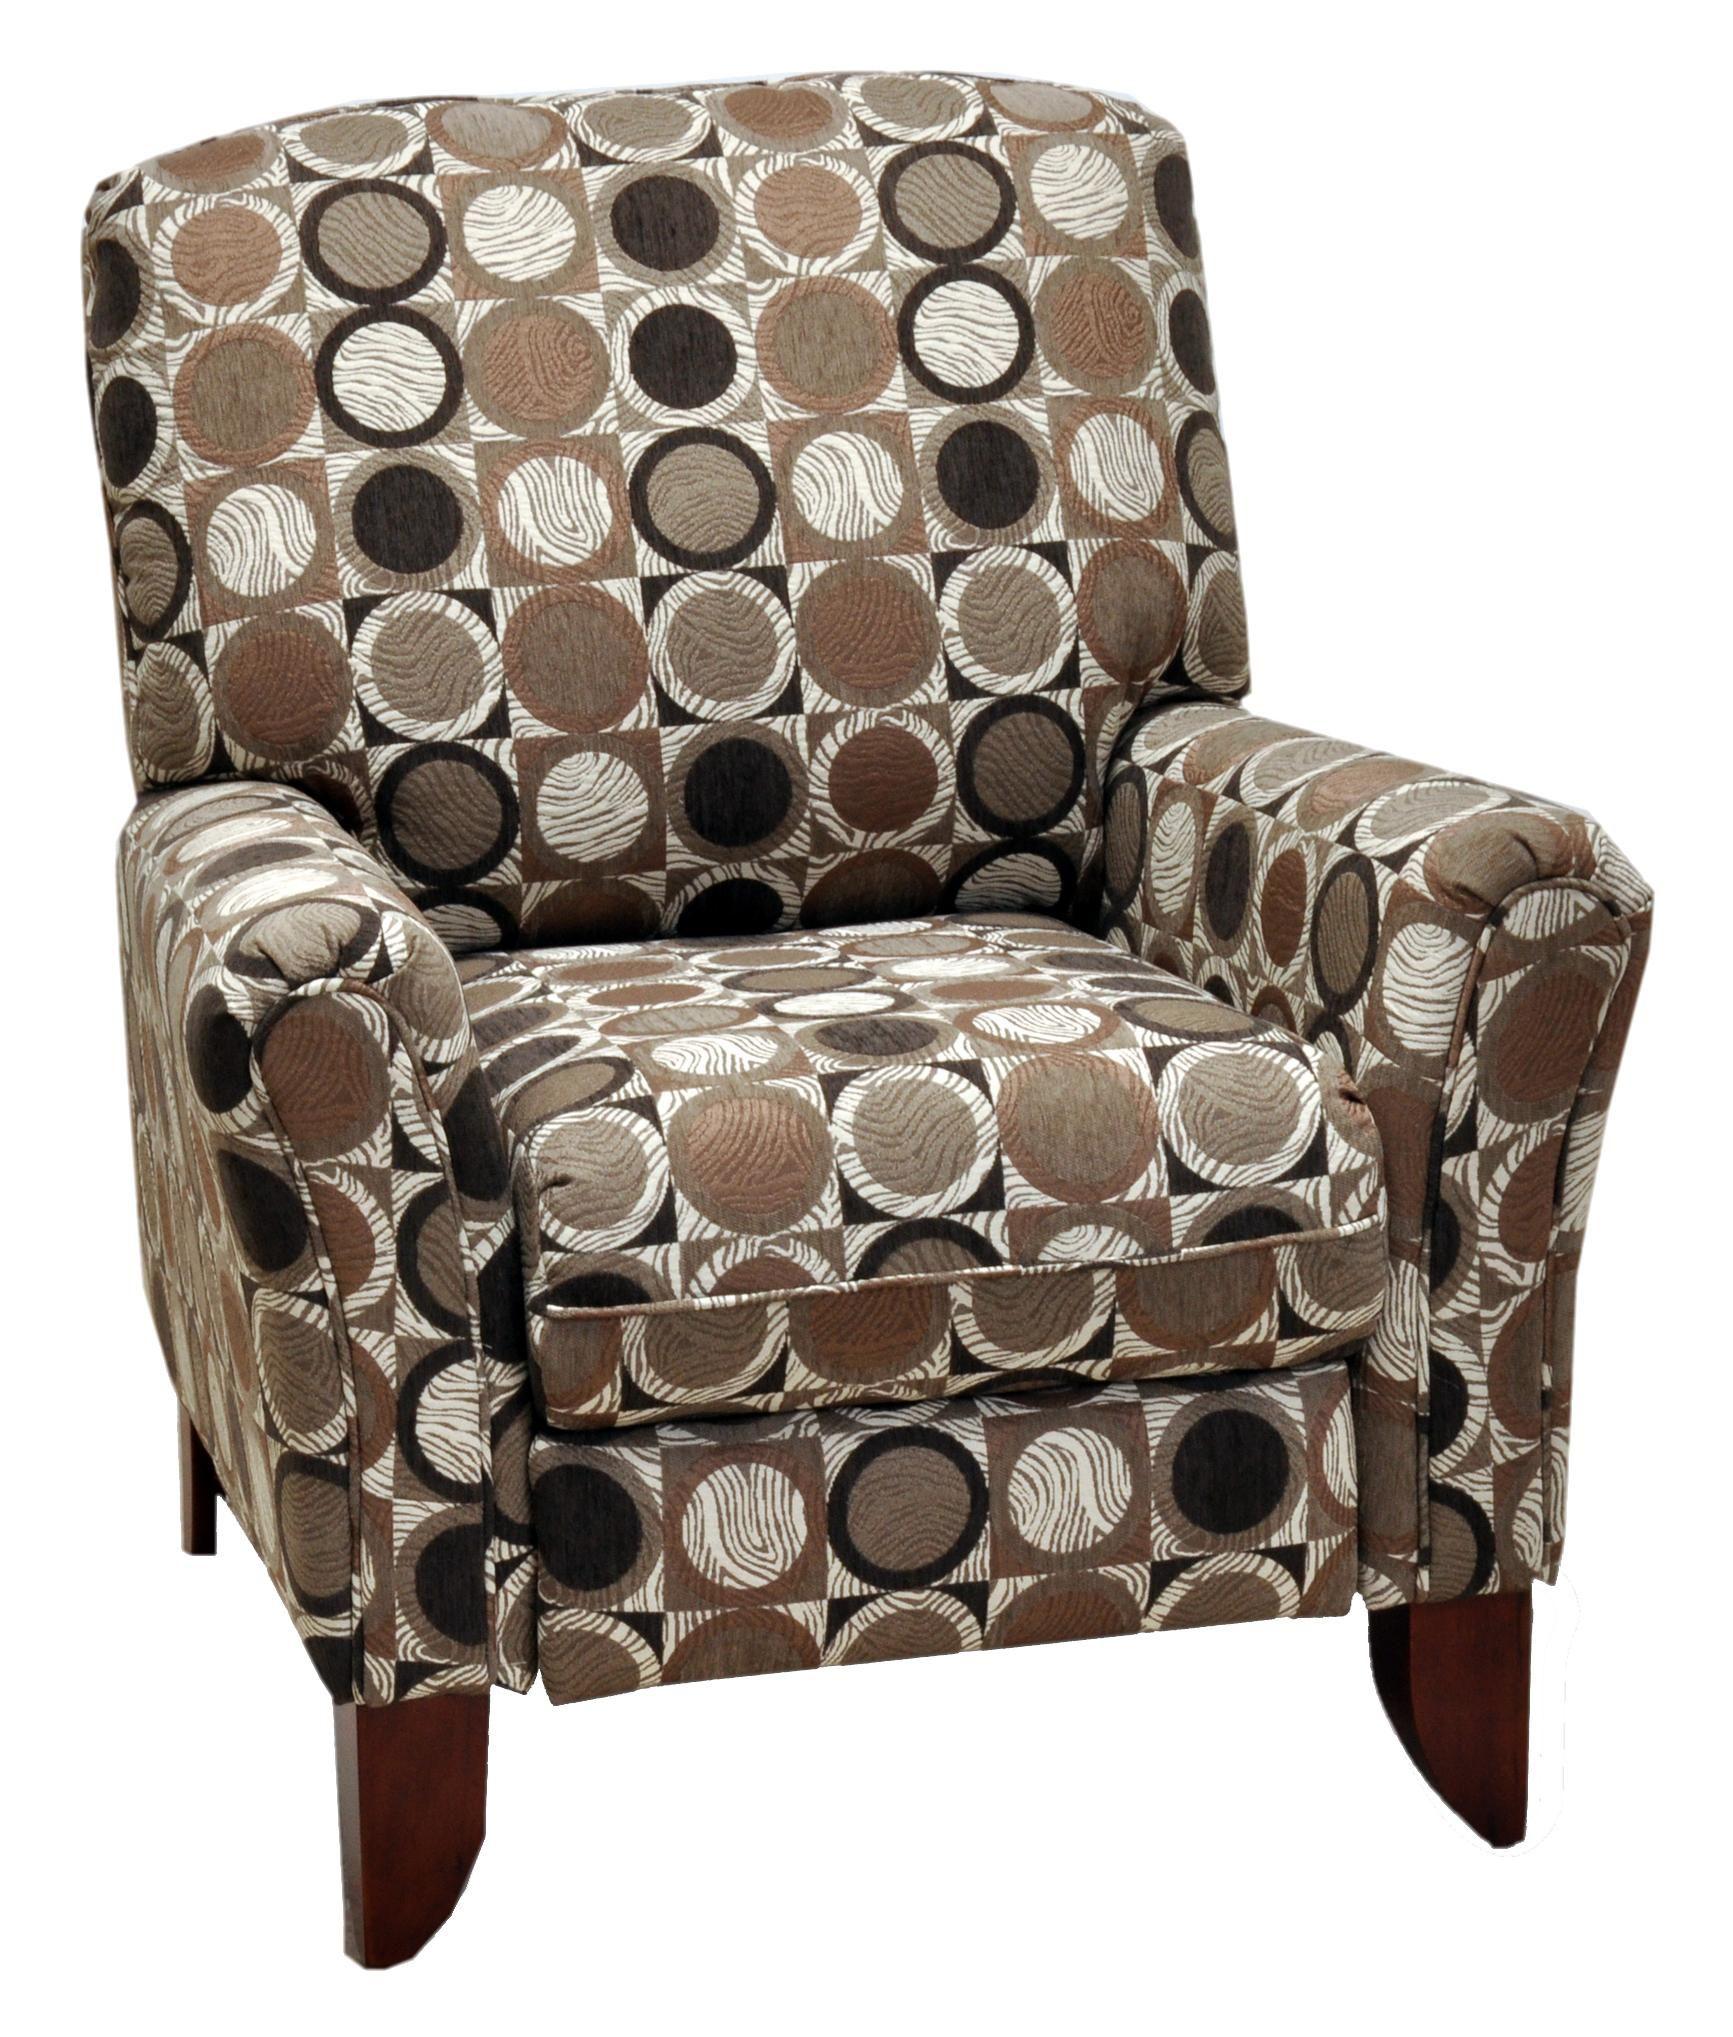 Lola High Leg Recliner By Vendor 379 Becker Furniture